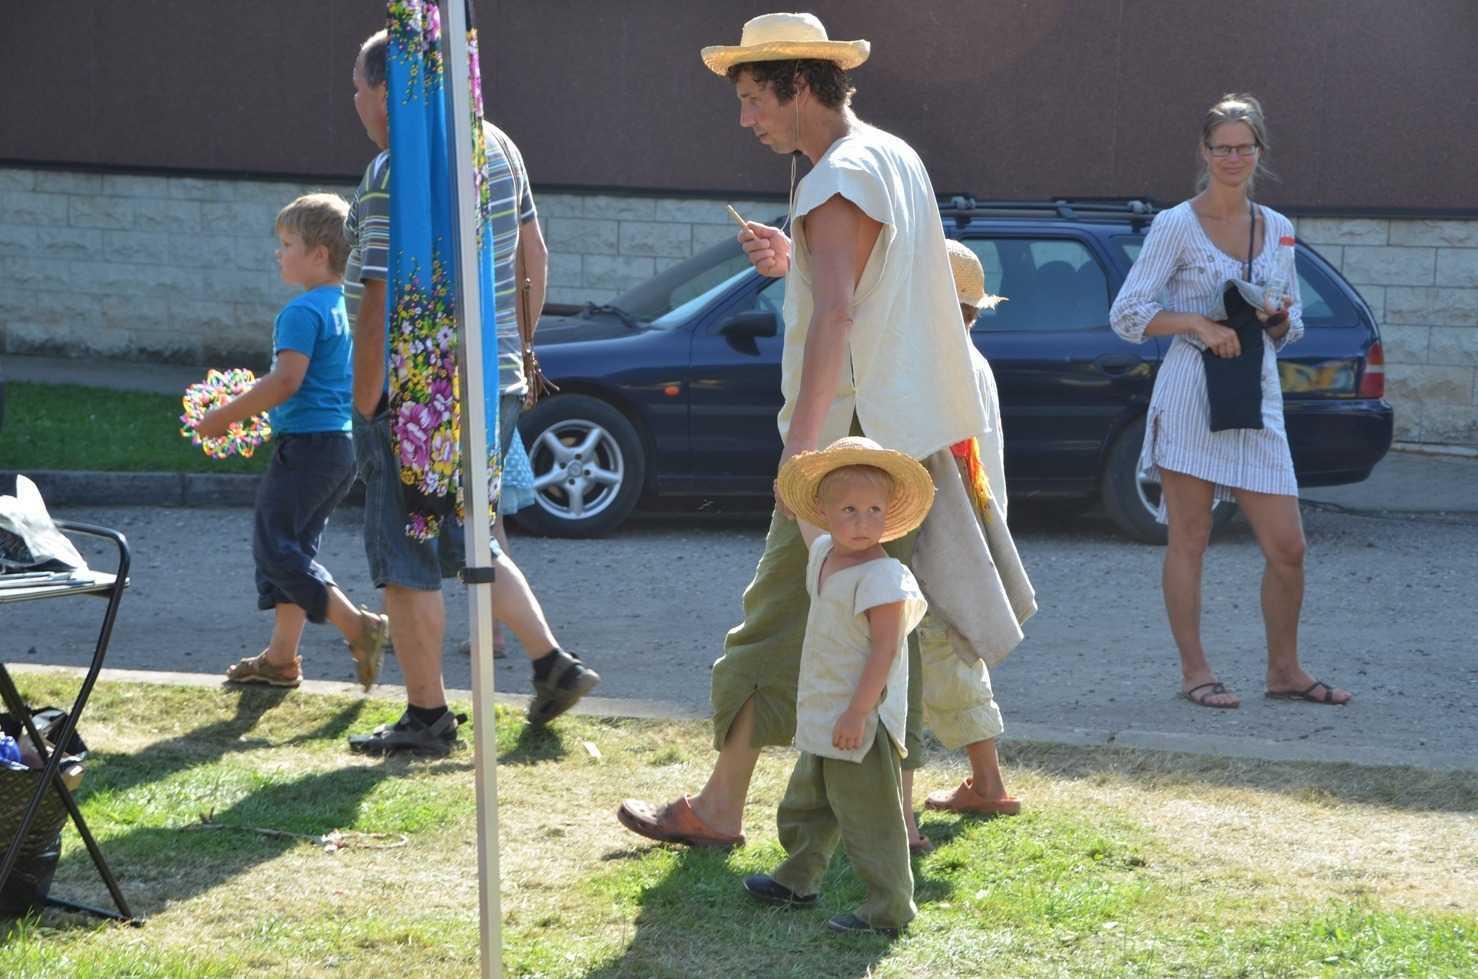 Viljandi pazarından insan manzaraları…